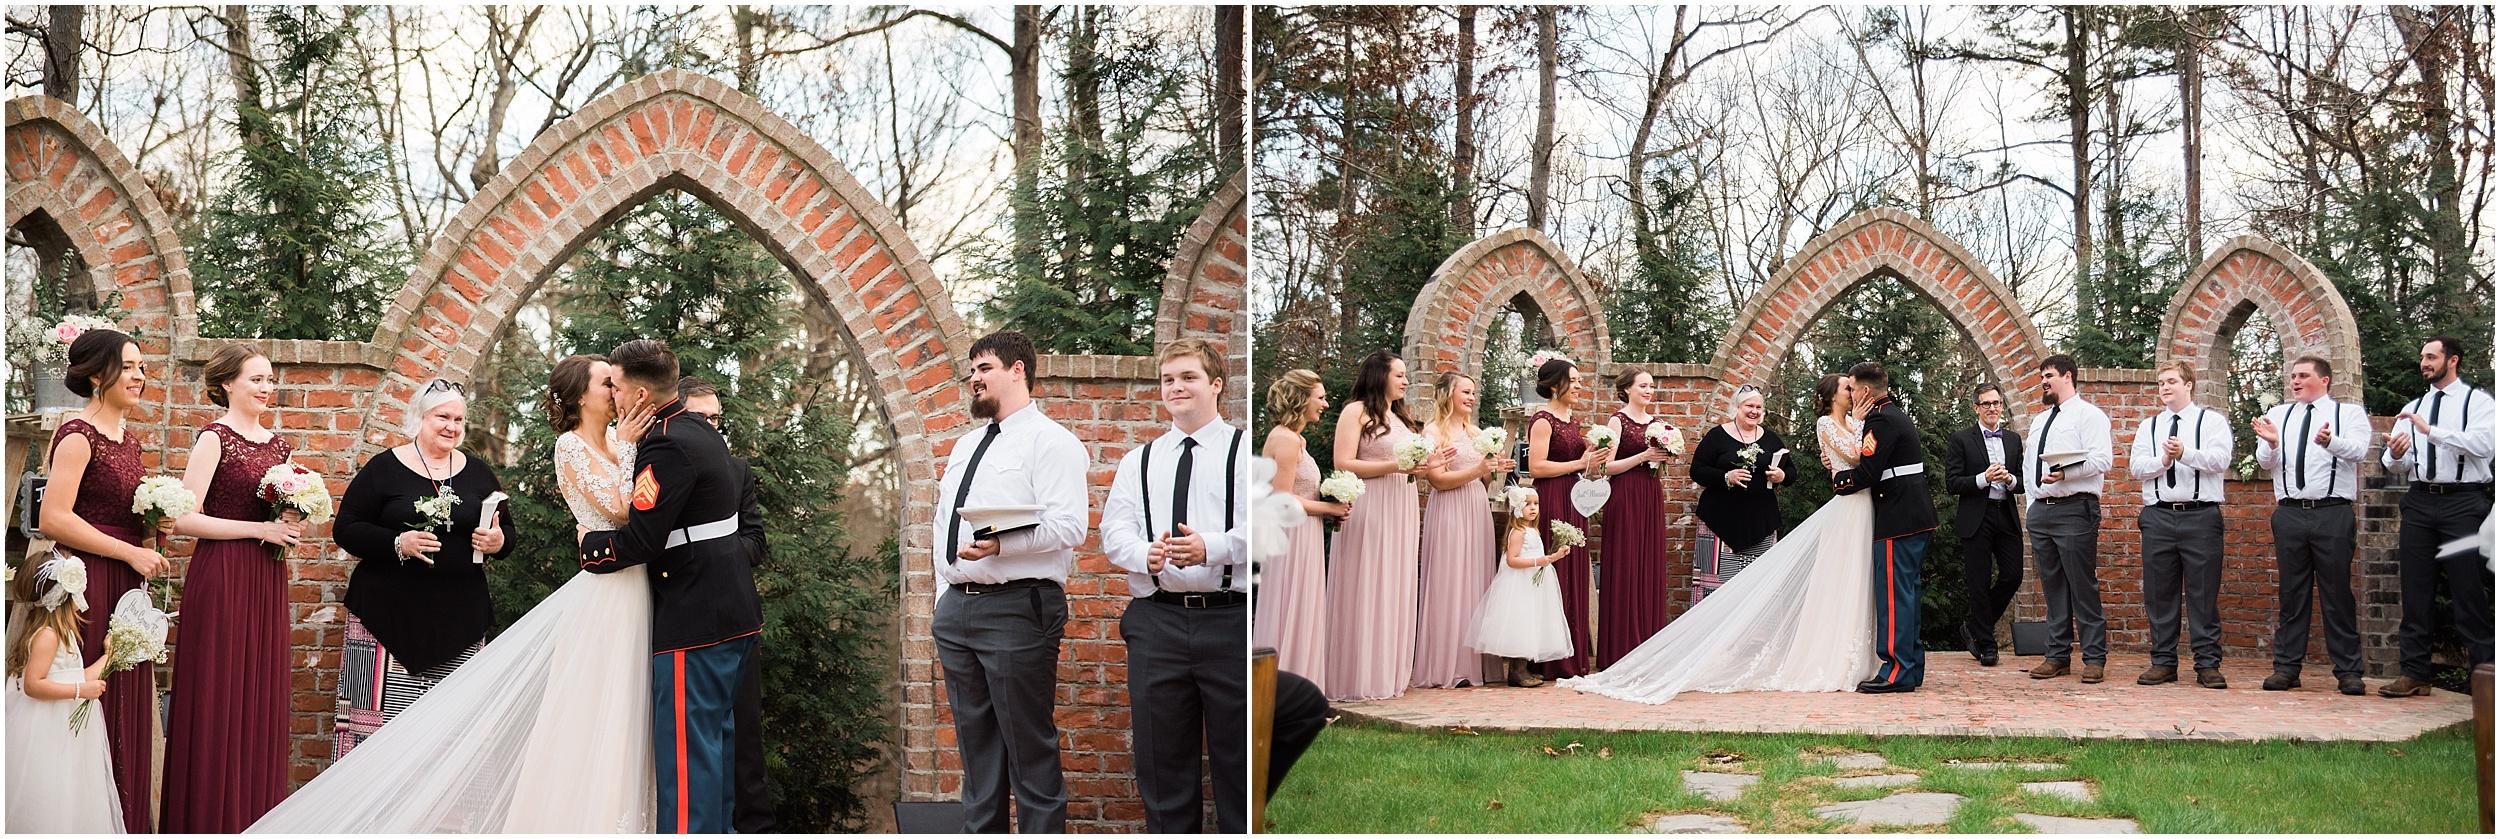 Ariel & Josh Southern Wedding in Monroe, North Carolina_0063.jpg